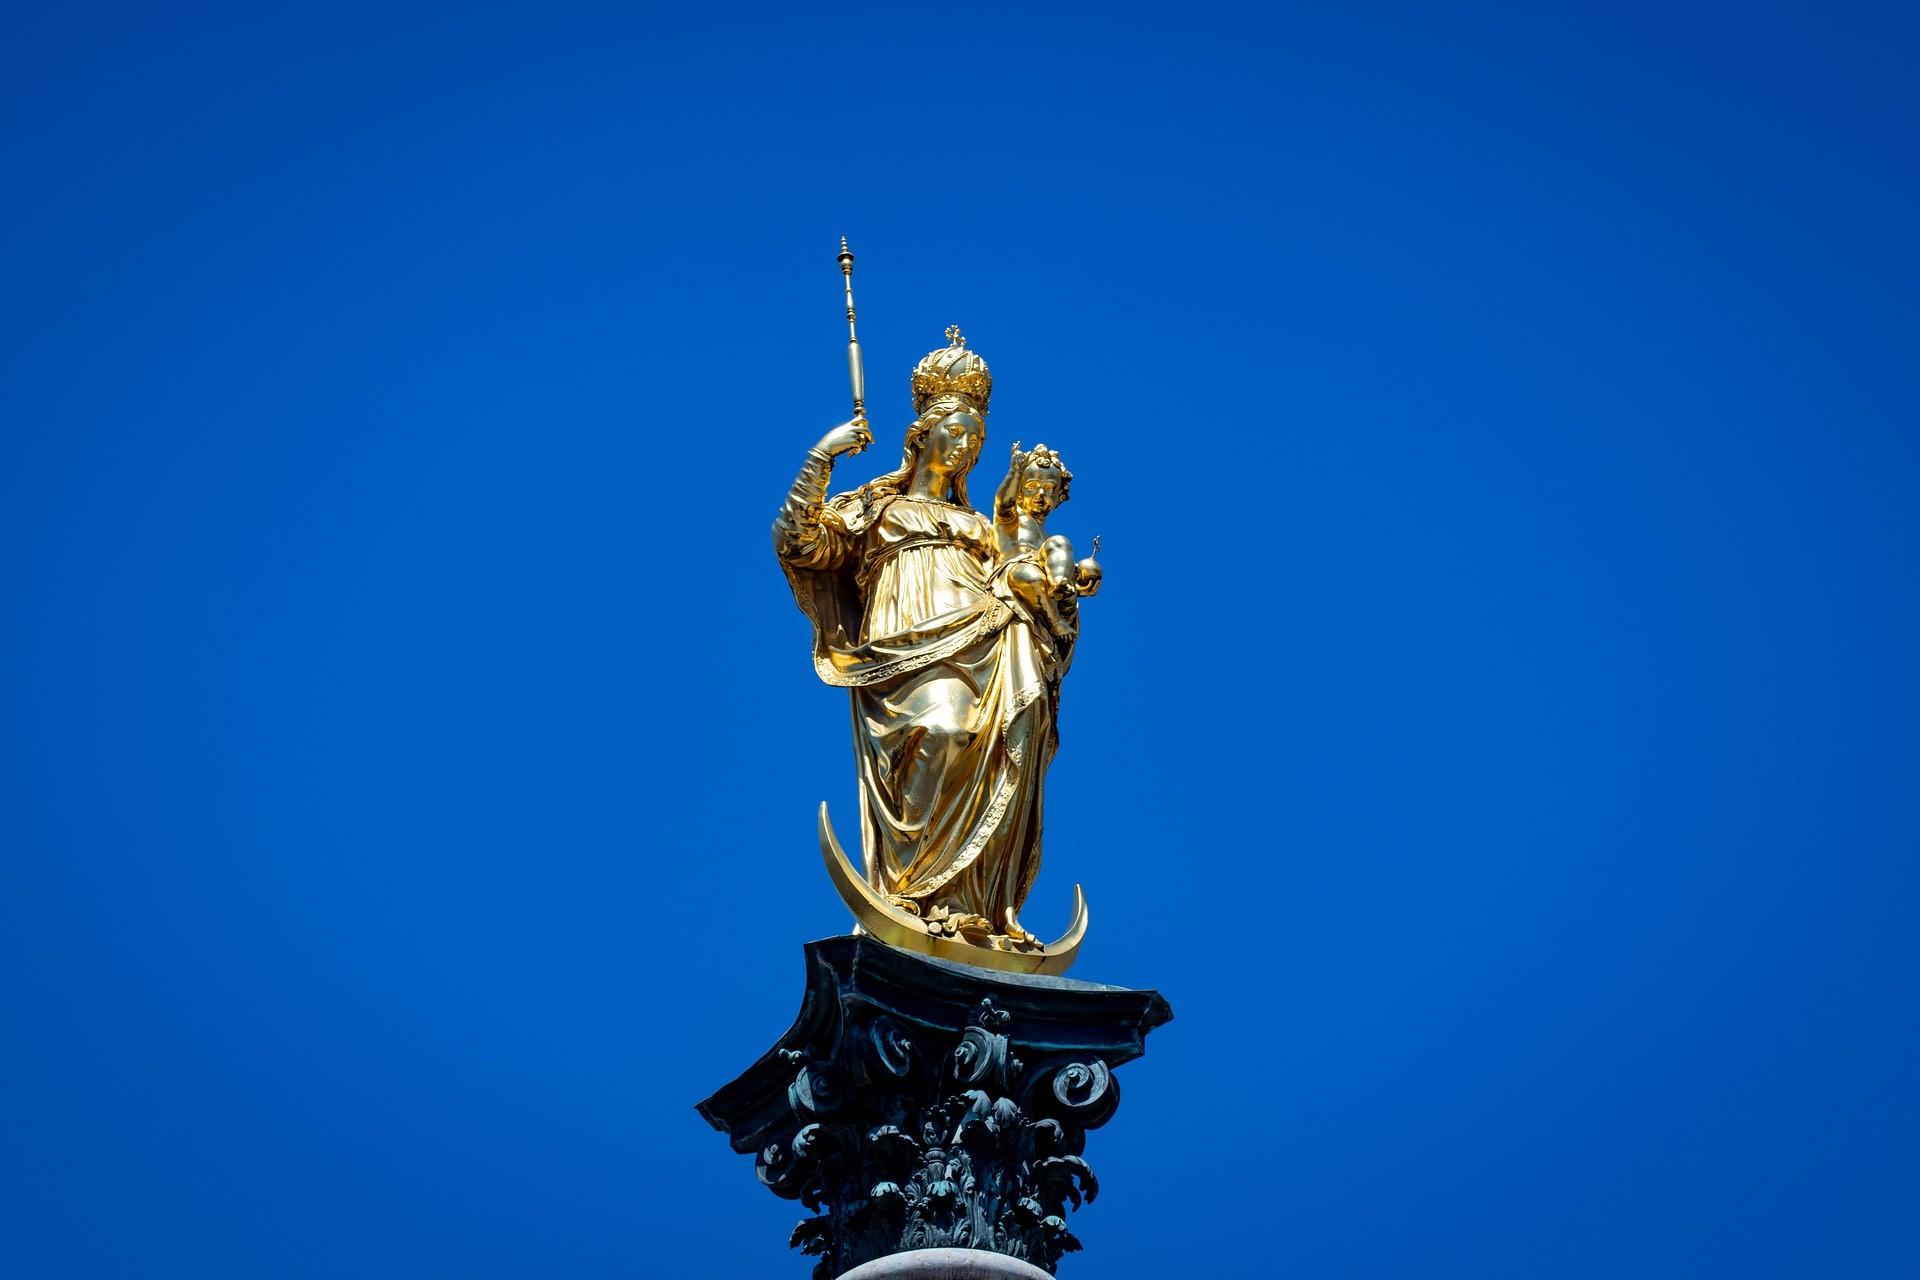 vergoldeten Marienstatue aus Bronze am Marienplatz